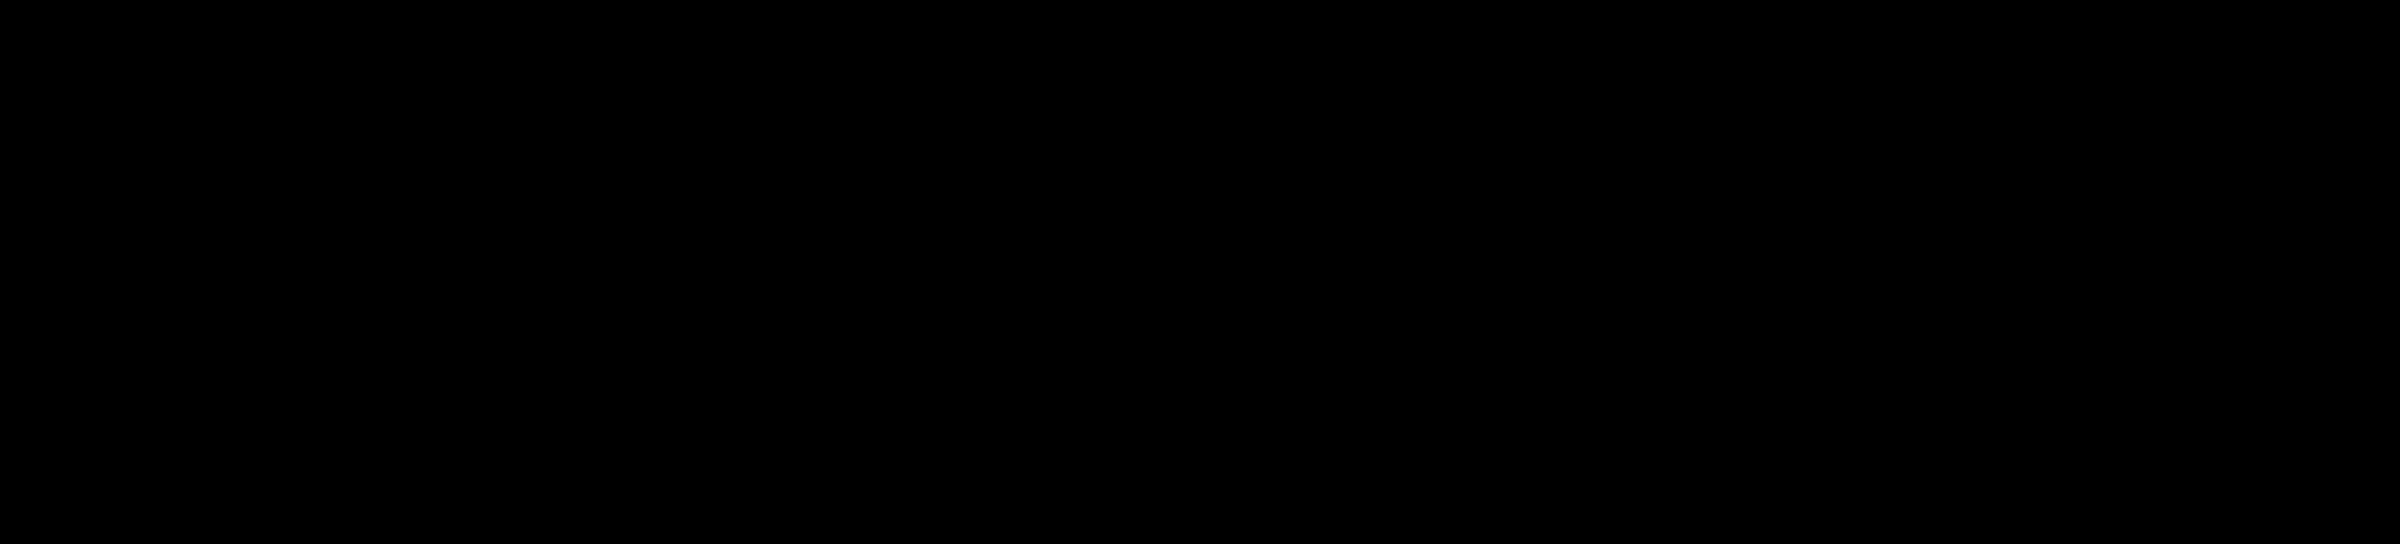 Cadillac Automobiles 2 Logo Png Transparent Svg Vector Freebie